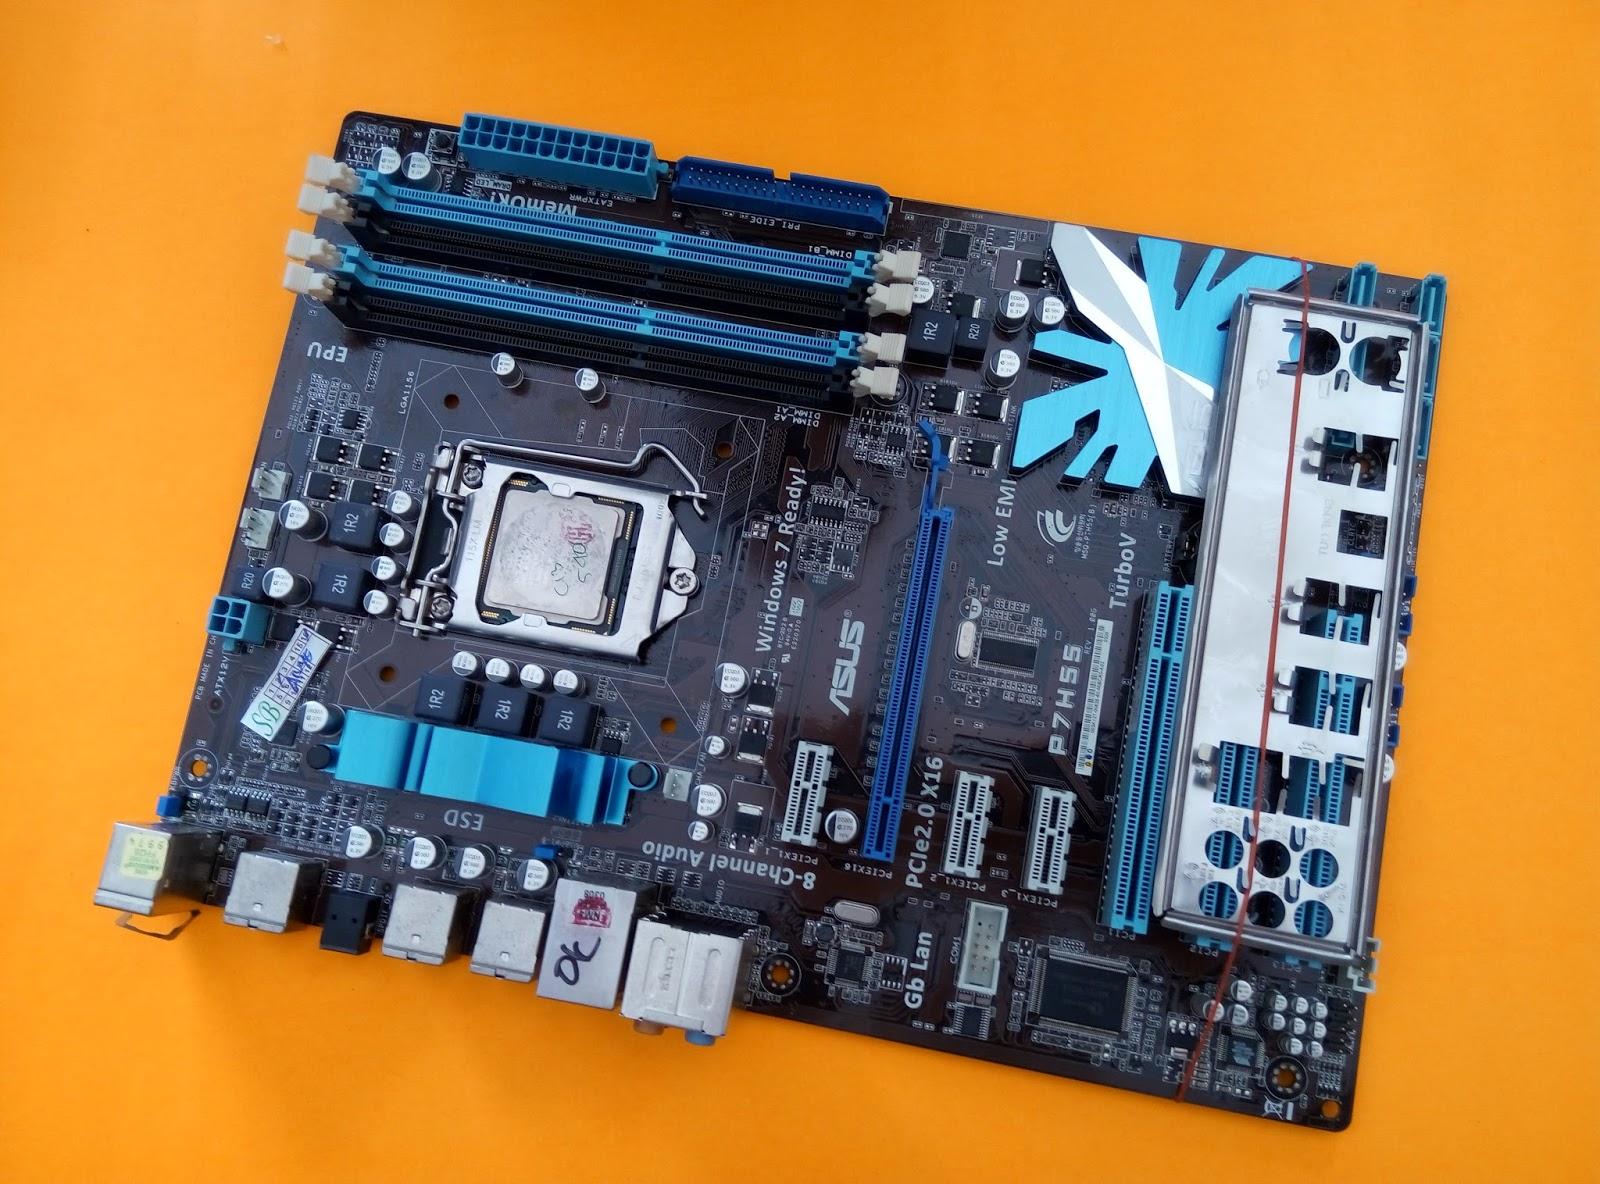 Jual Mobo Intel Core I3 Welcome To Motherboard Suntech H55 Lga 1156 Sj Bass Computer